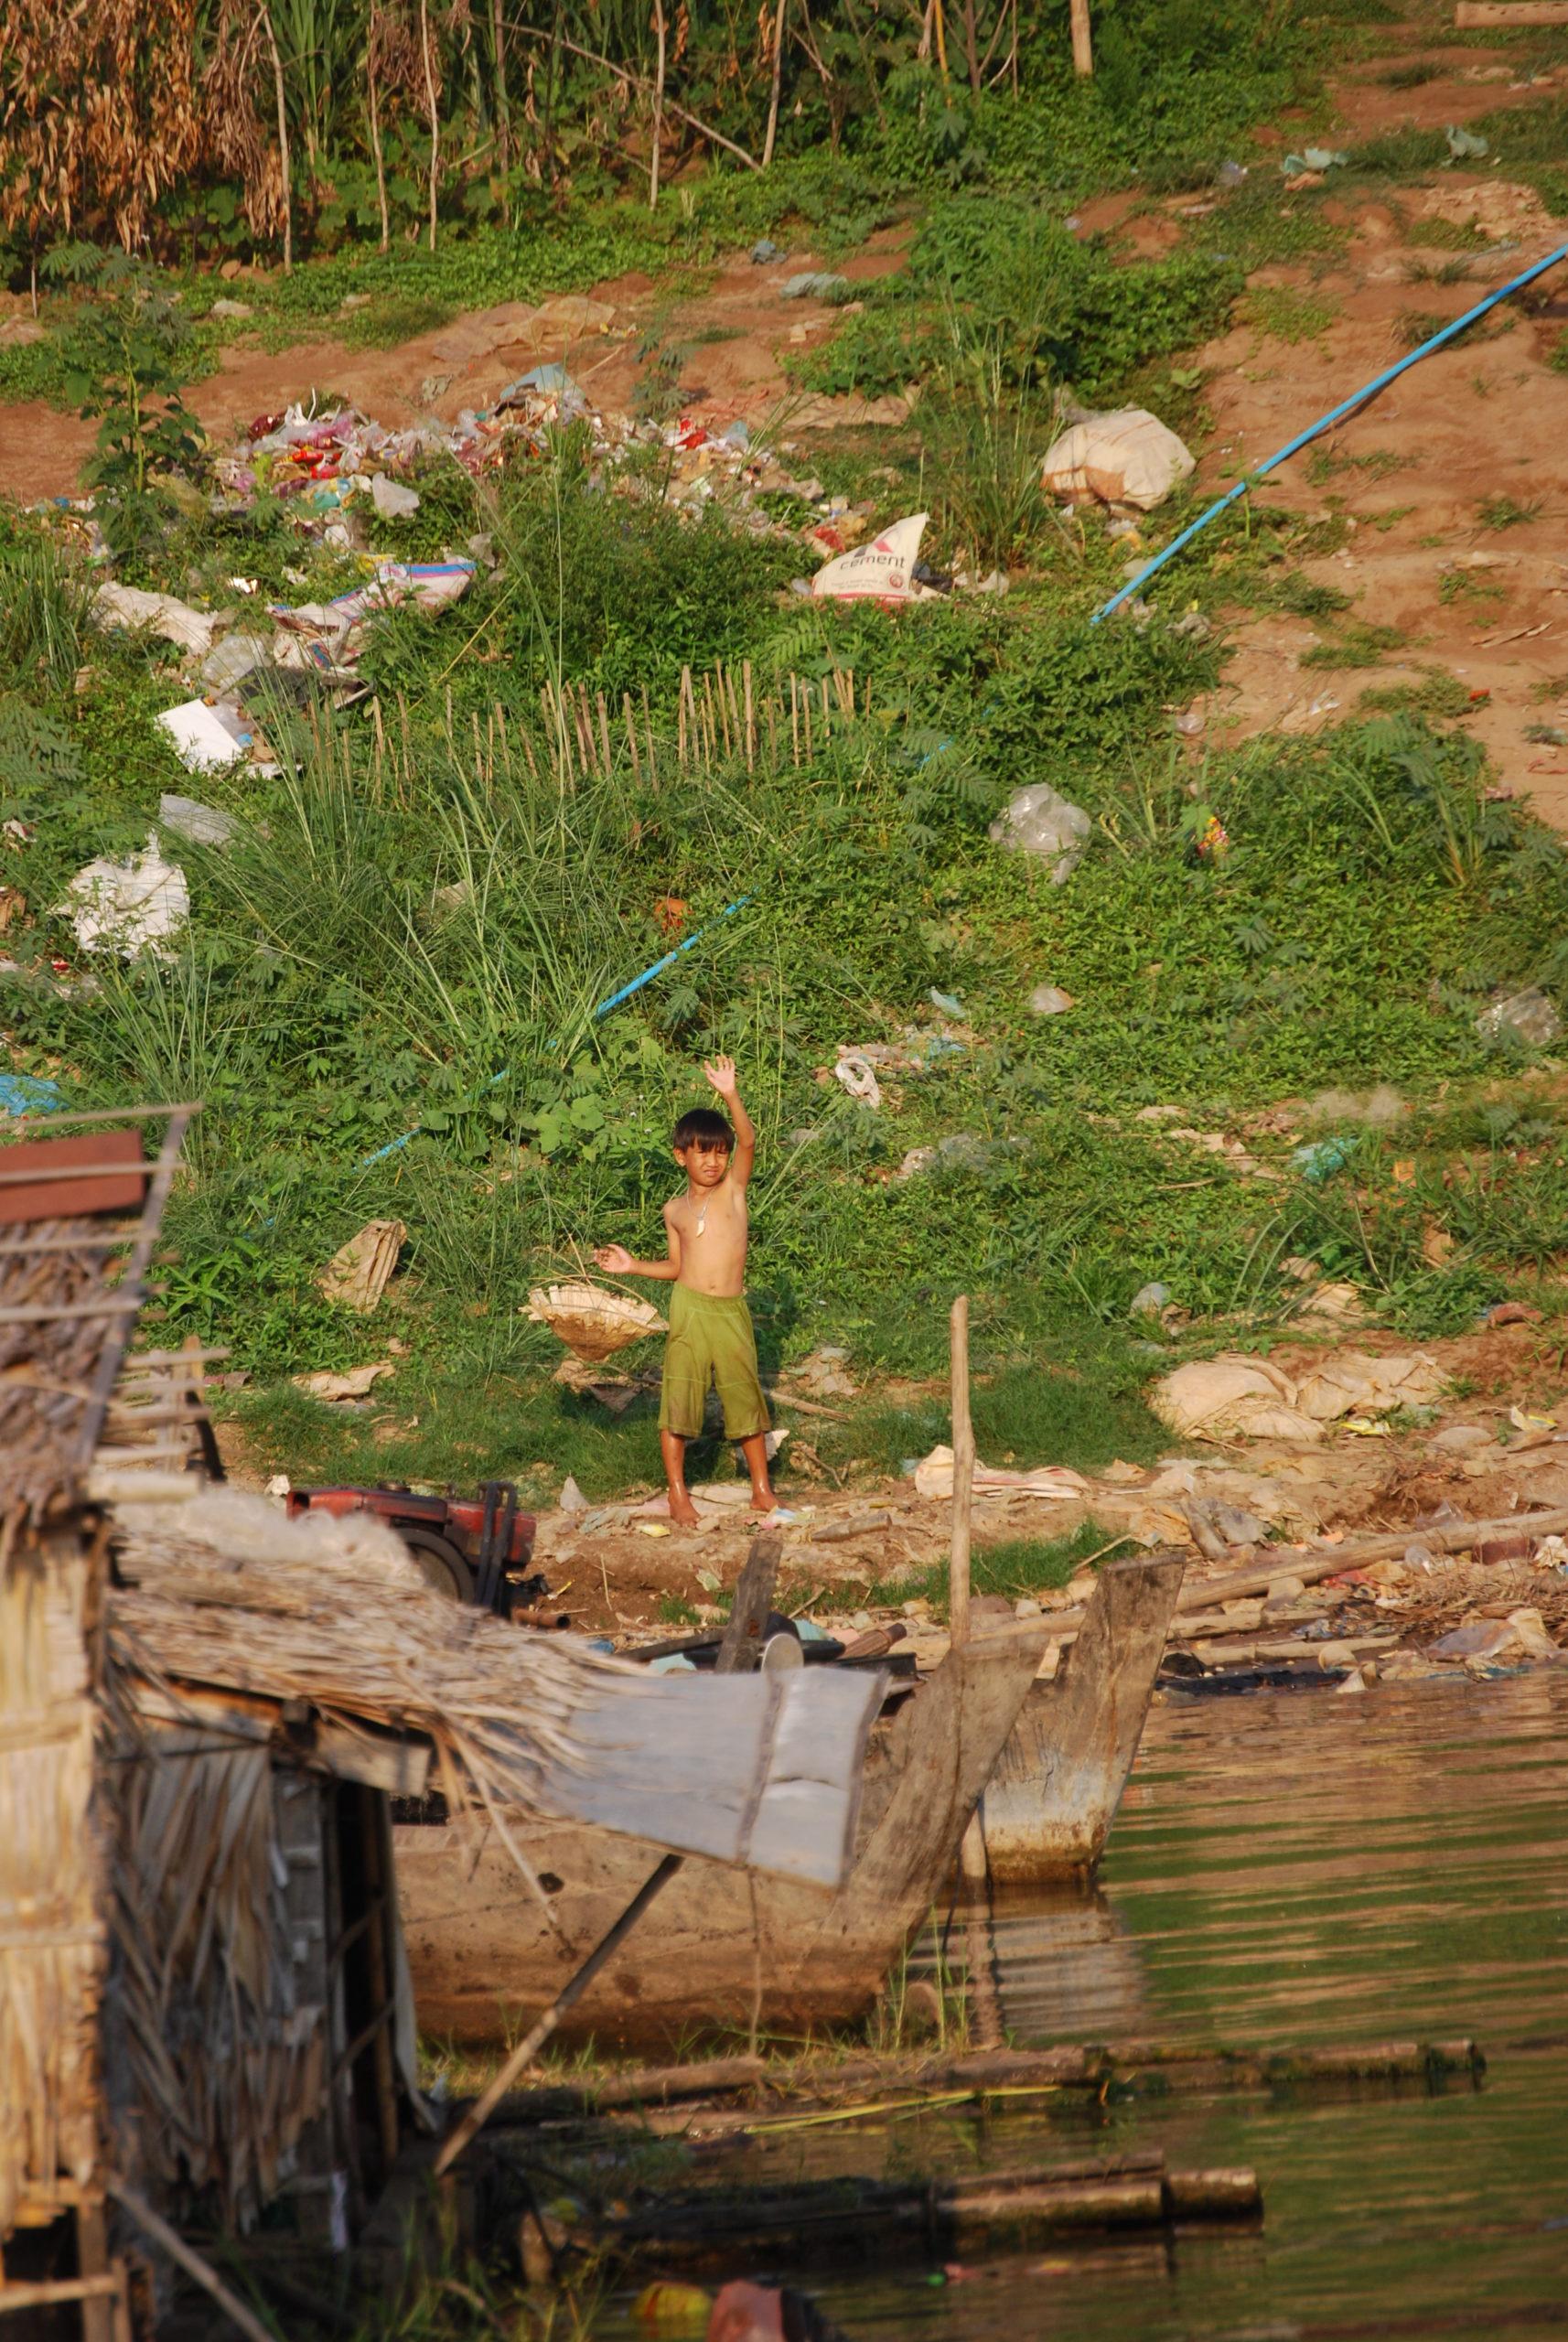 Kind winkend am Mekong in Phnom Penh - Cambodia